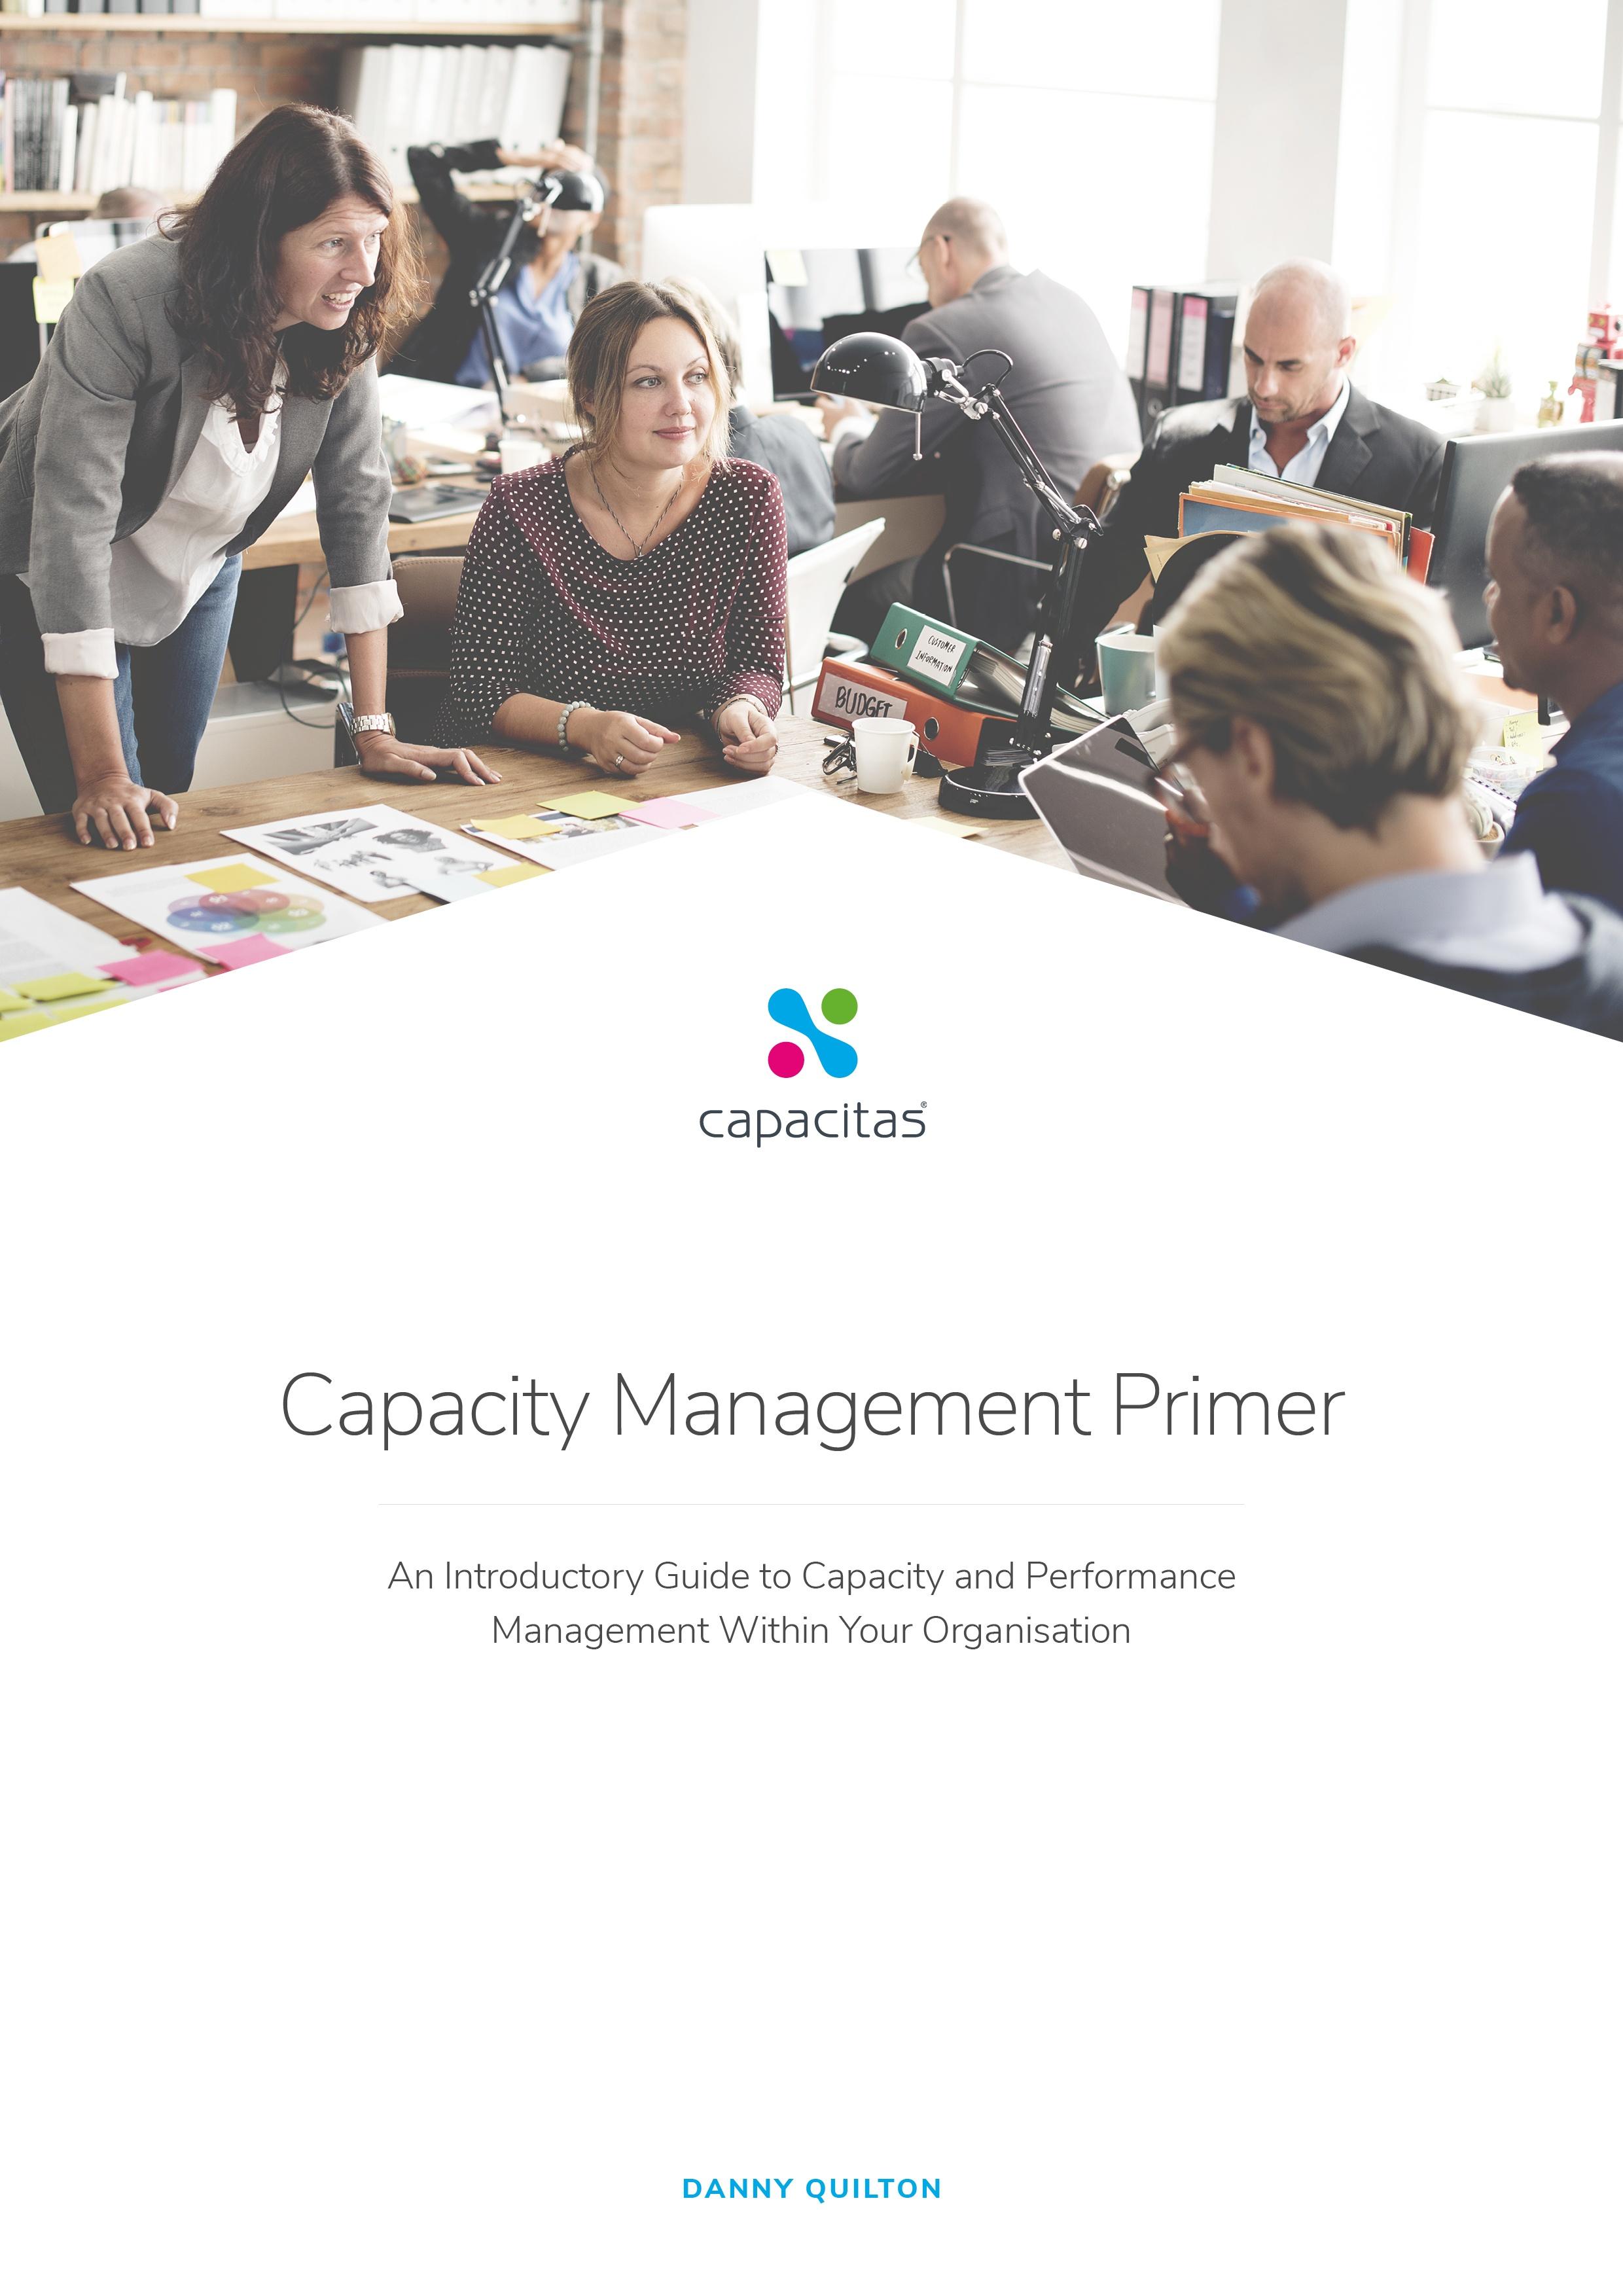 Capacity Management Primer